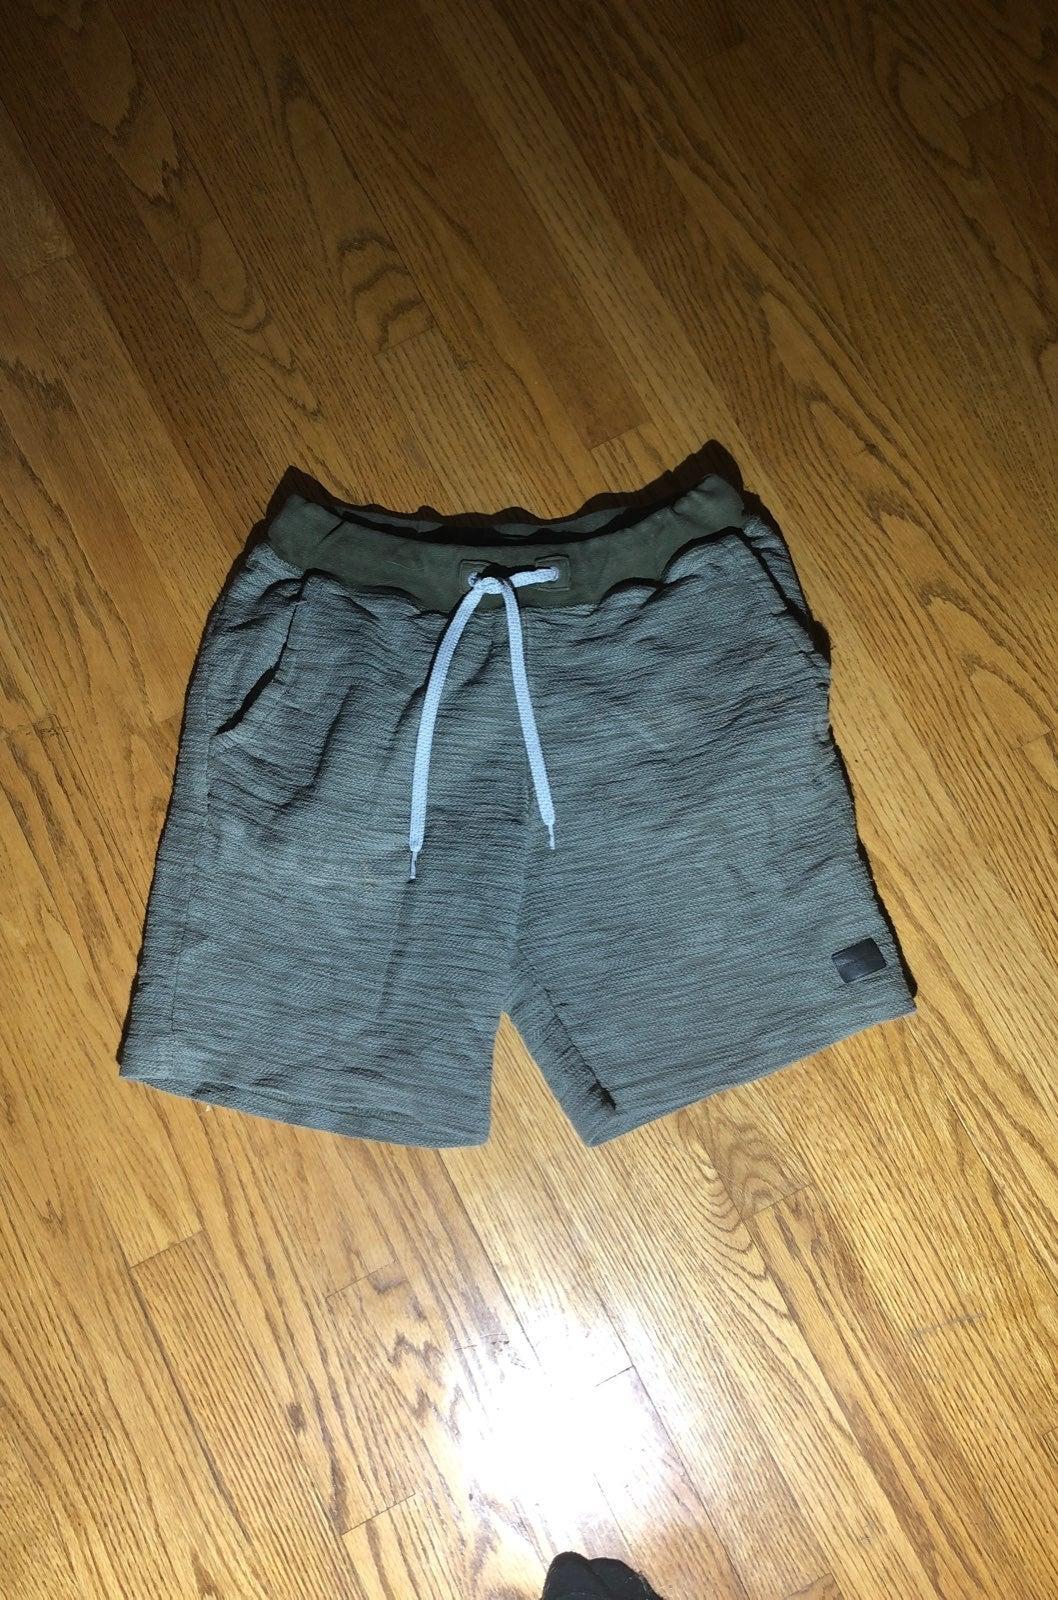 shorts men small